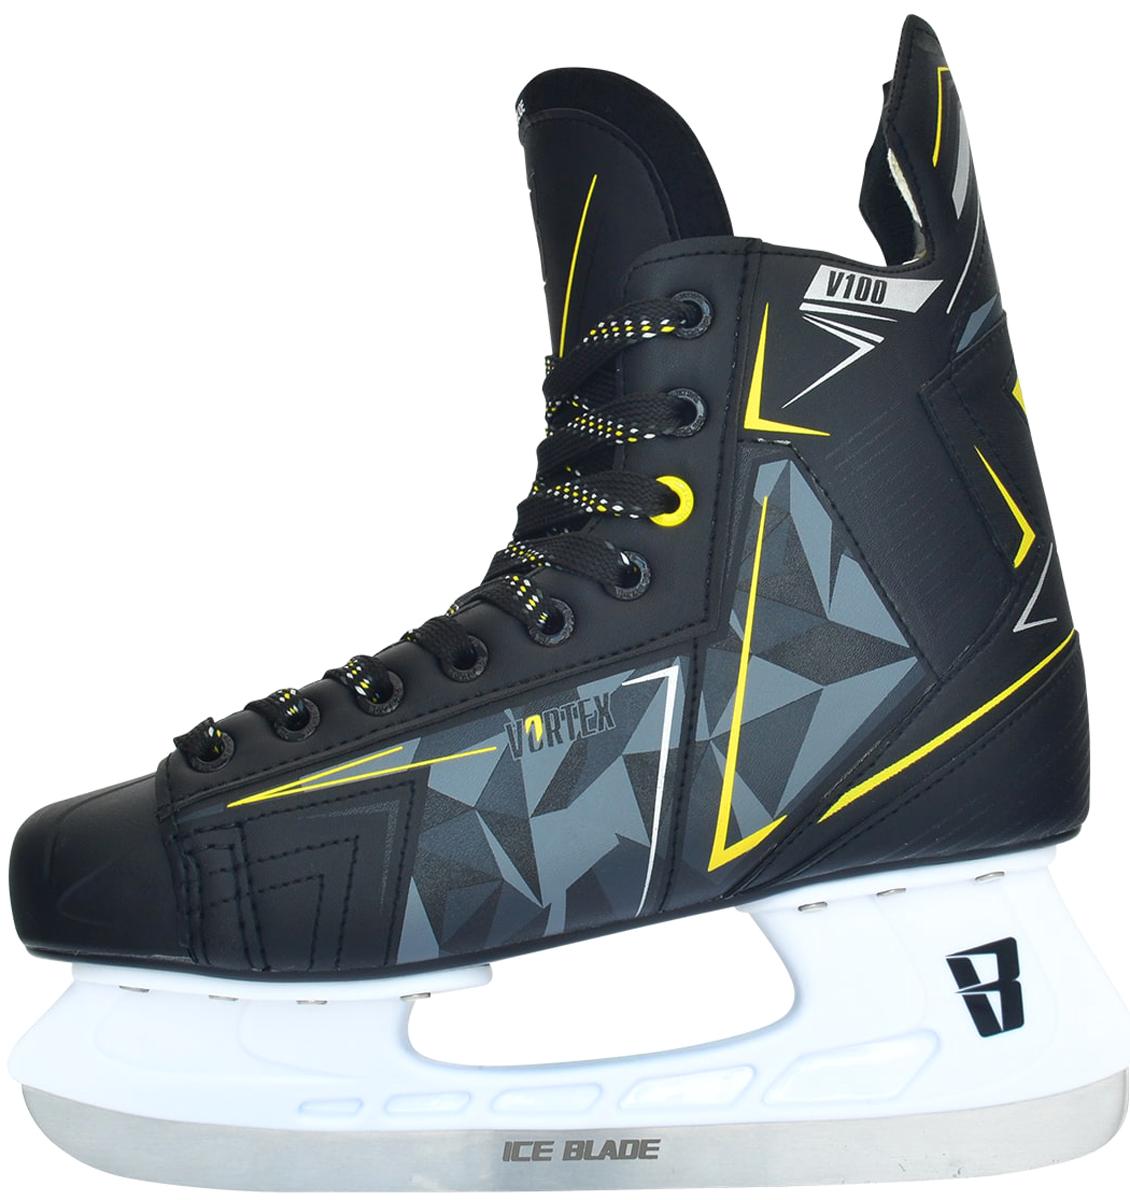 "Коньки хоккейные мужские Ice Blade ""Vortex"", цвет: серый, желтый, белый. Размер 42"